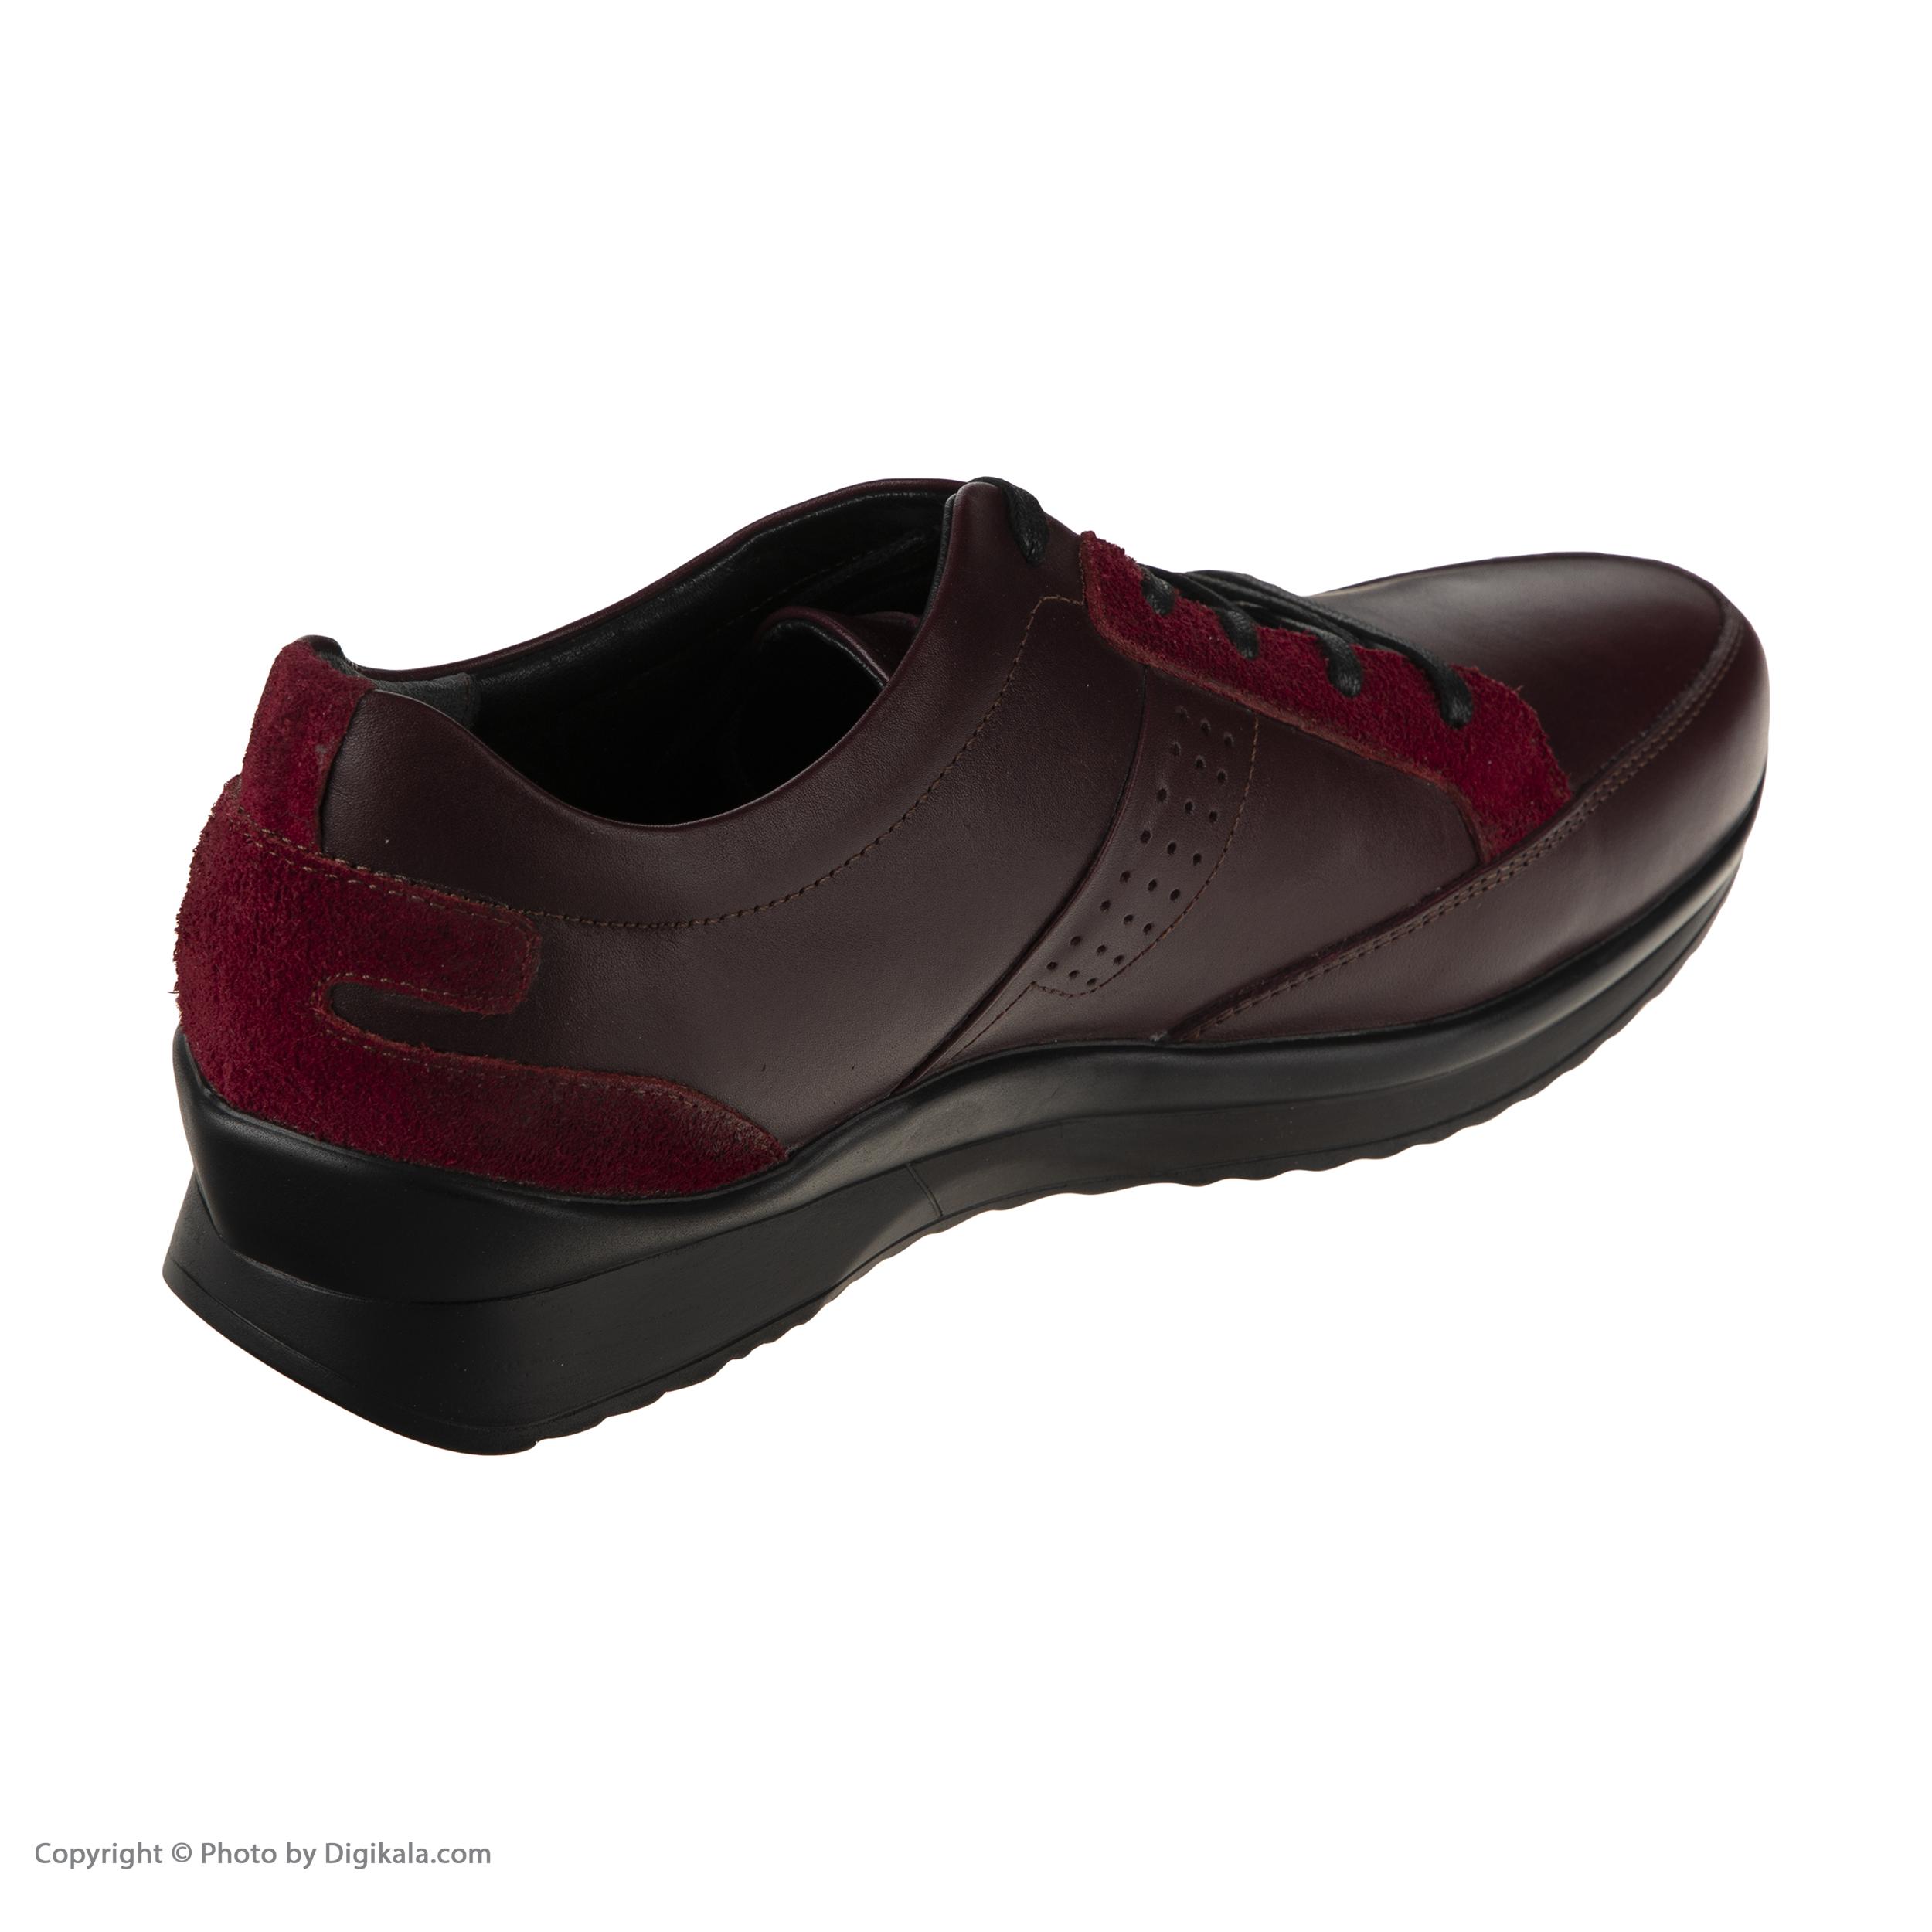 کفش روزمره مردانه چرمیران مدل 0389-Toma-005 -  - 8